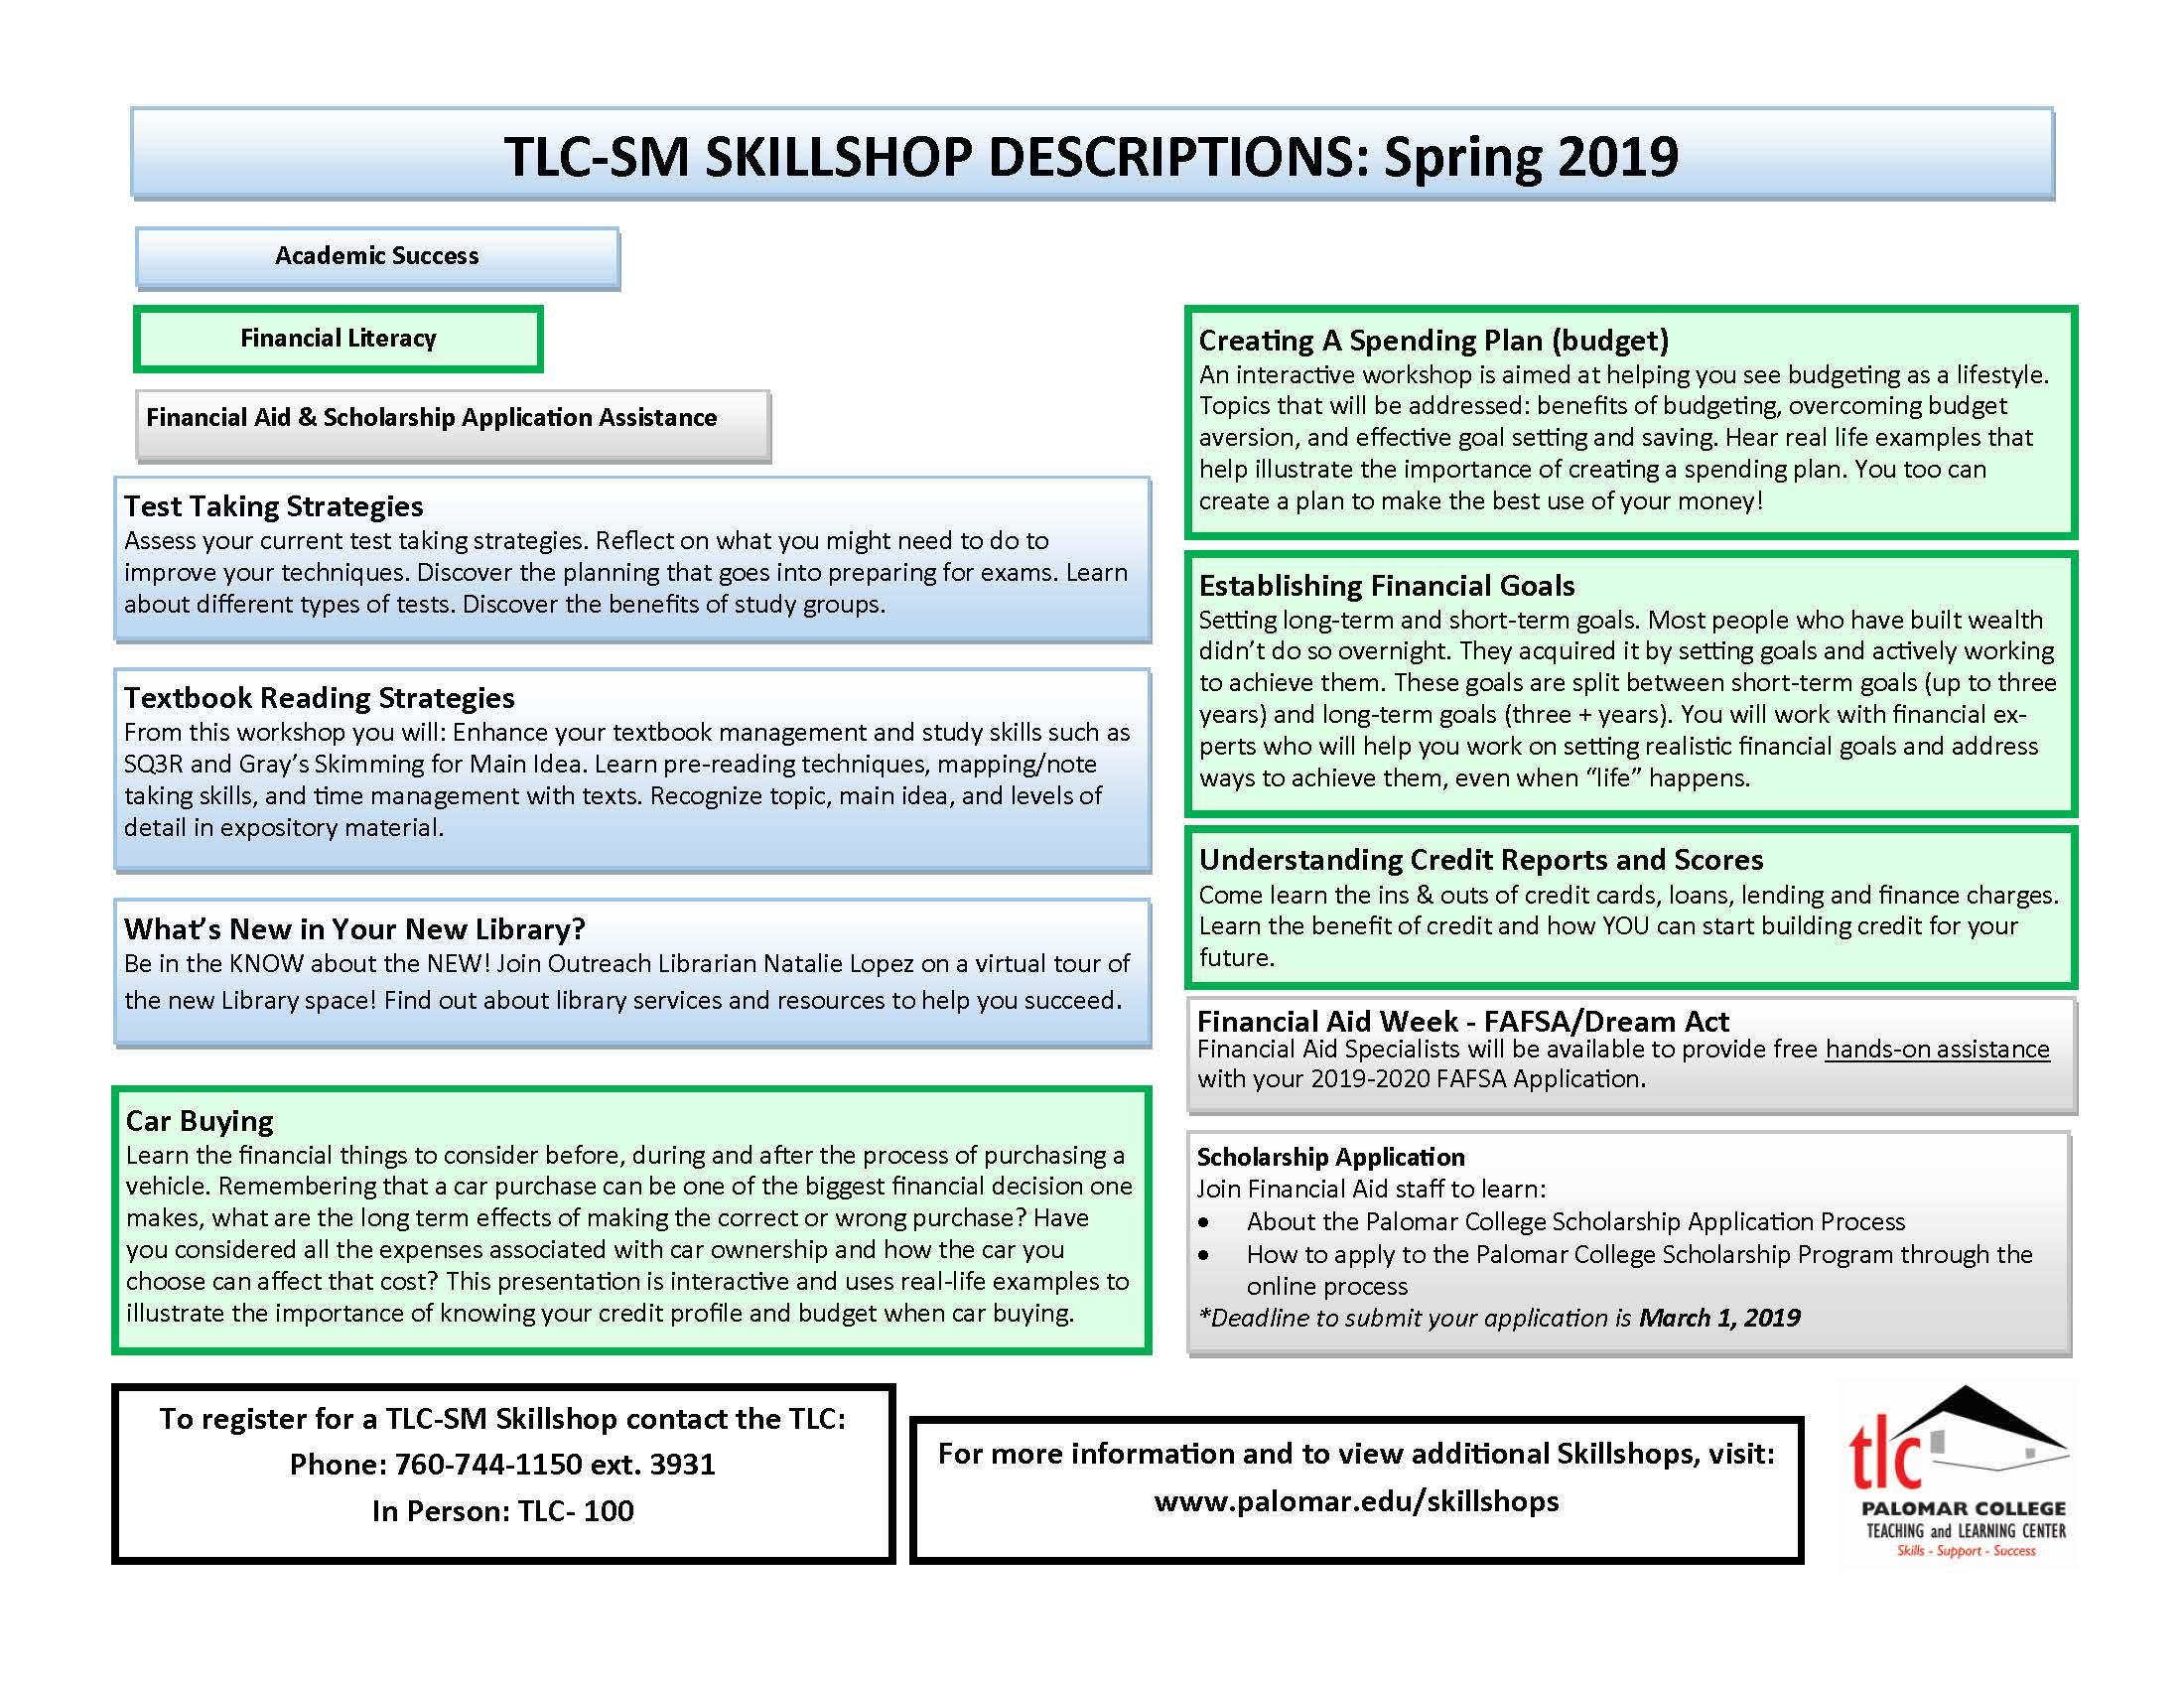 Palomar College Calendar 2020 Skillshops (Student Success Workshops) – TLC SM